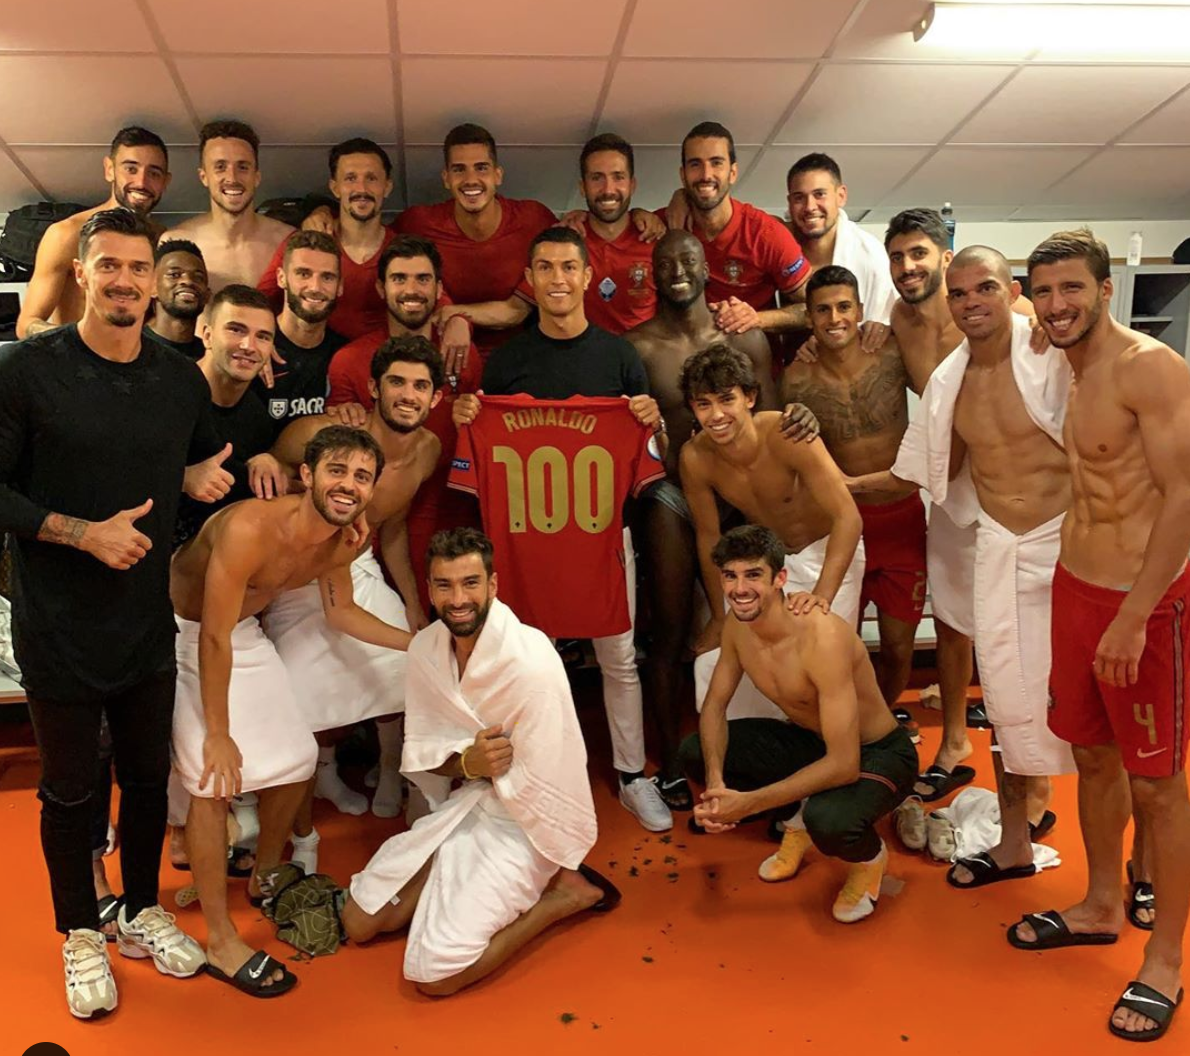 C罗庆祝国家队第100球:感谢所有队友、教练和工作人员